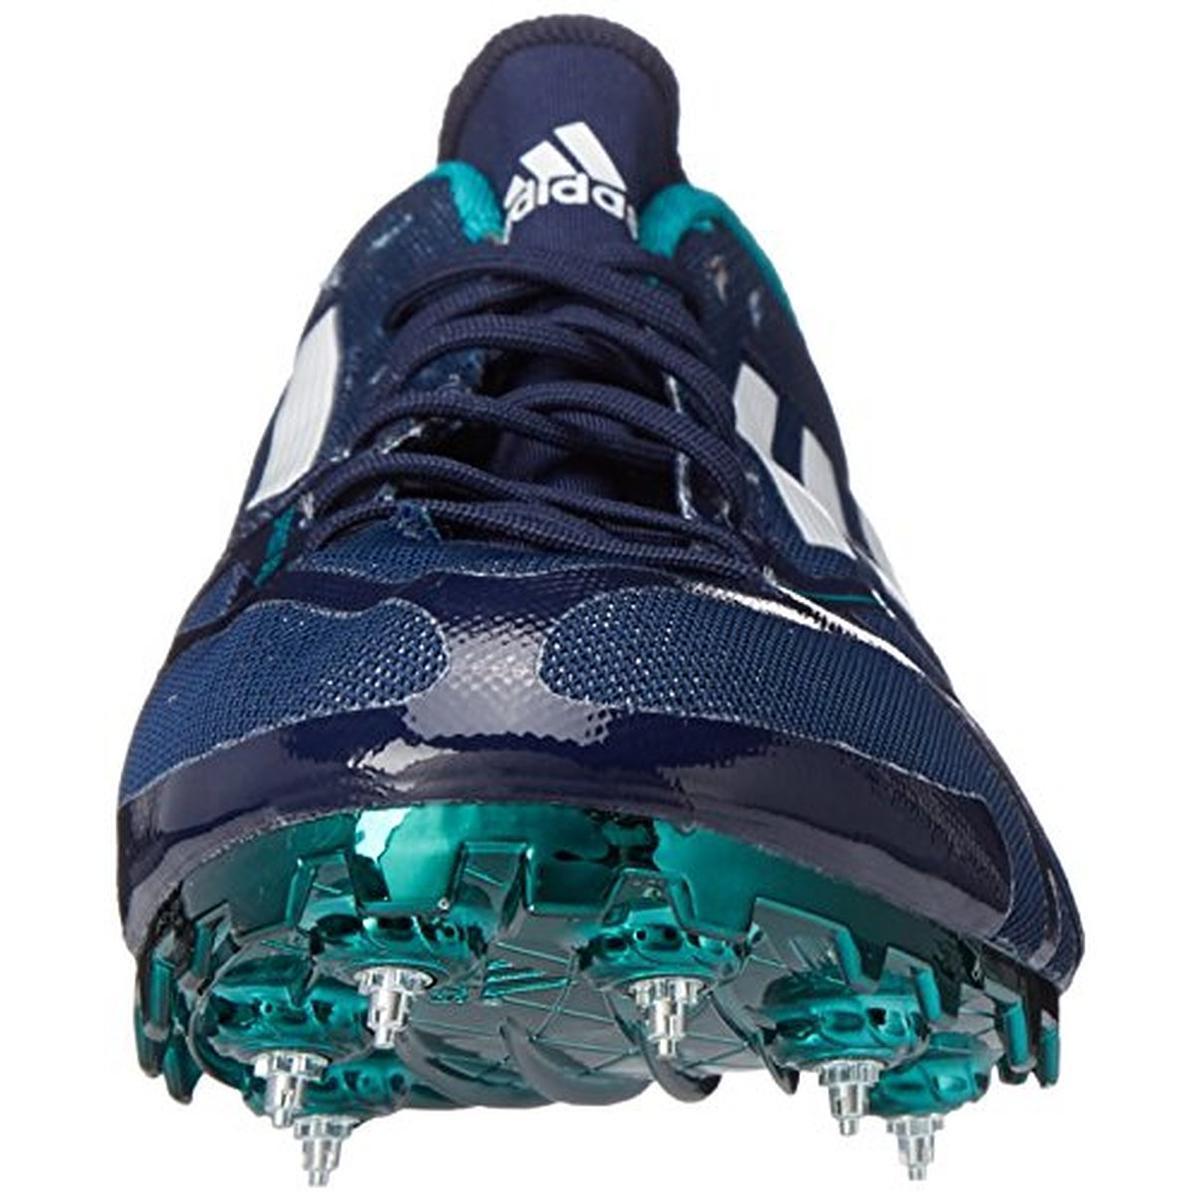 Adidas Performance Mens Adizero MD 2 Navy Athletic Running Shoes 15 M (D) $140